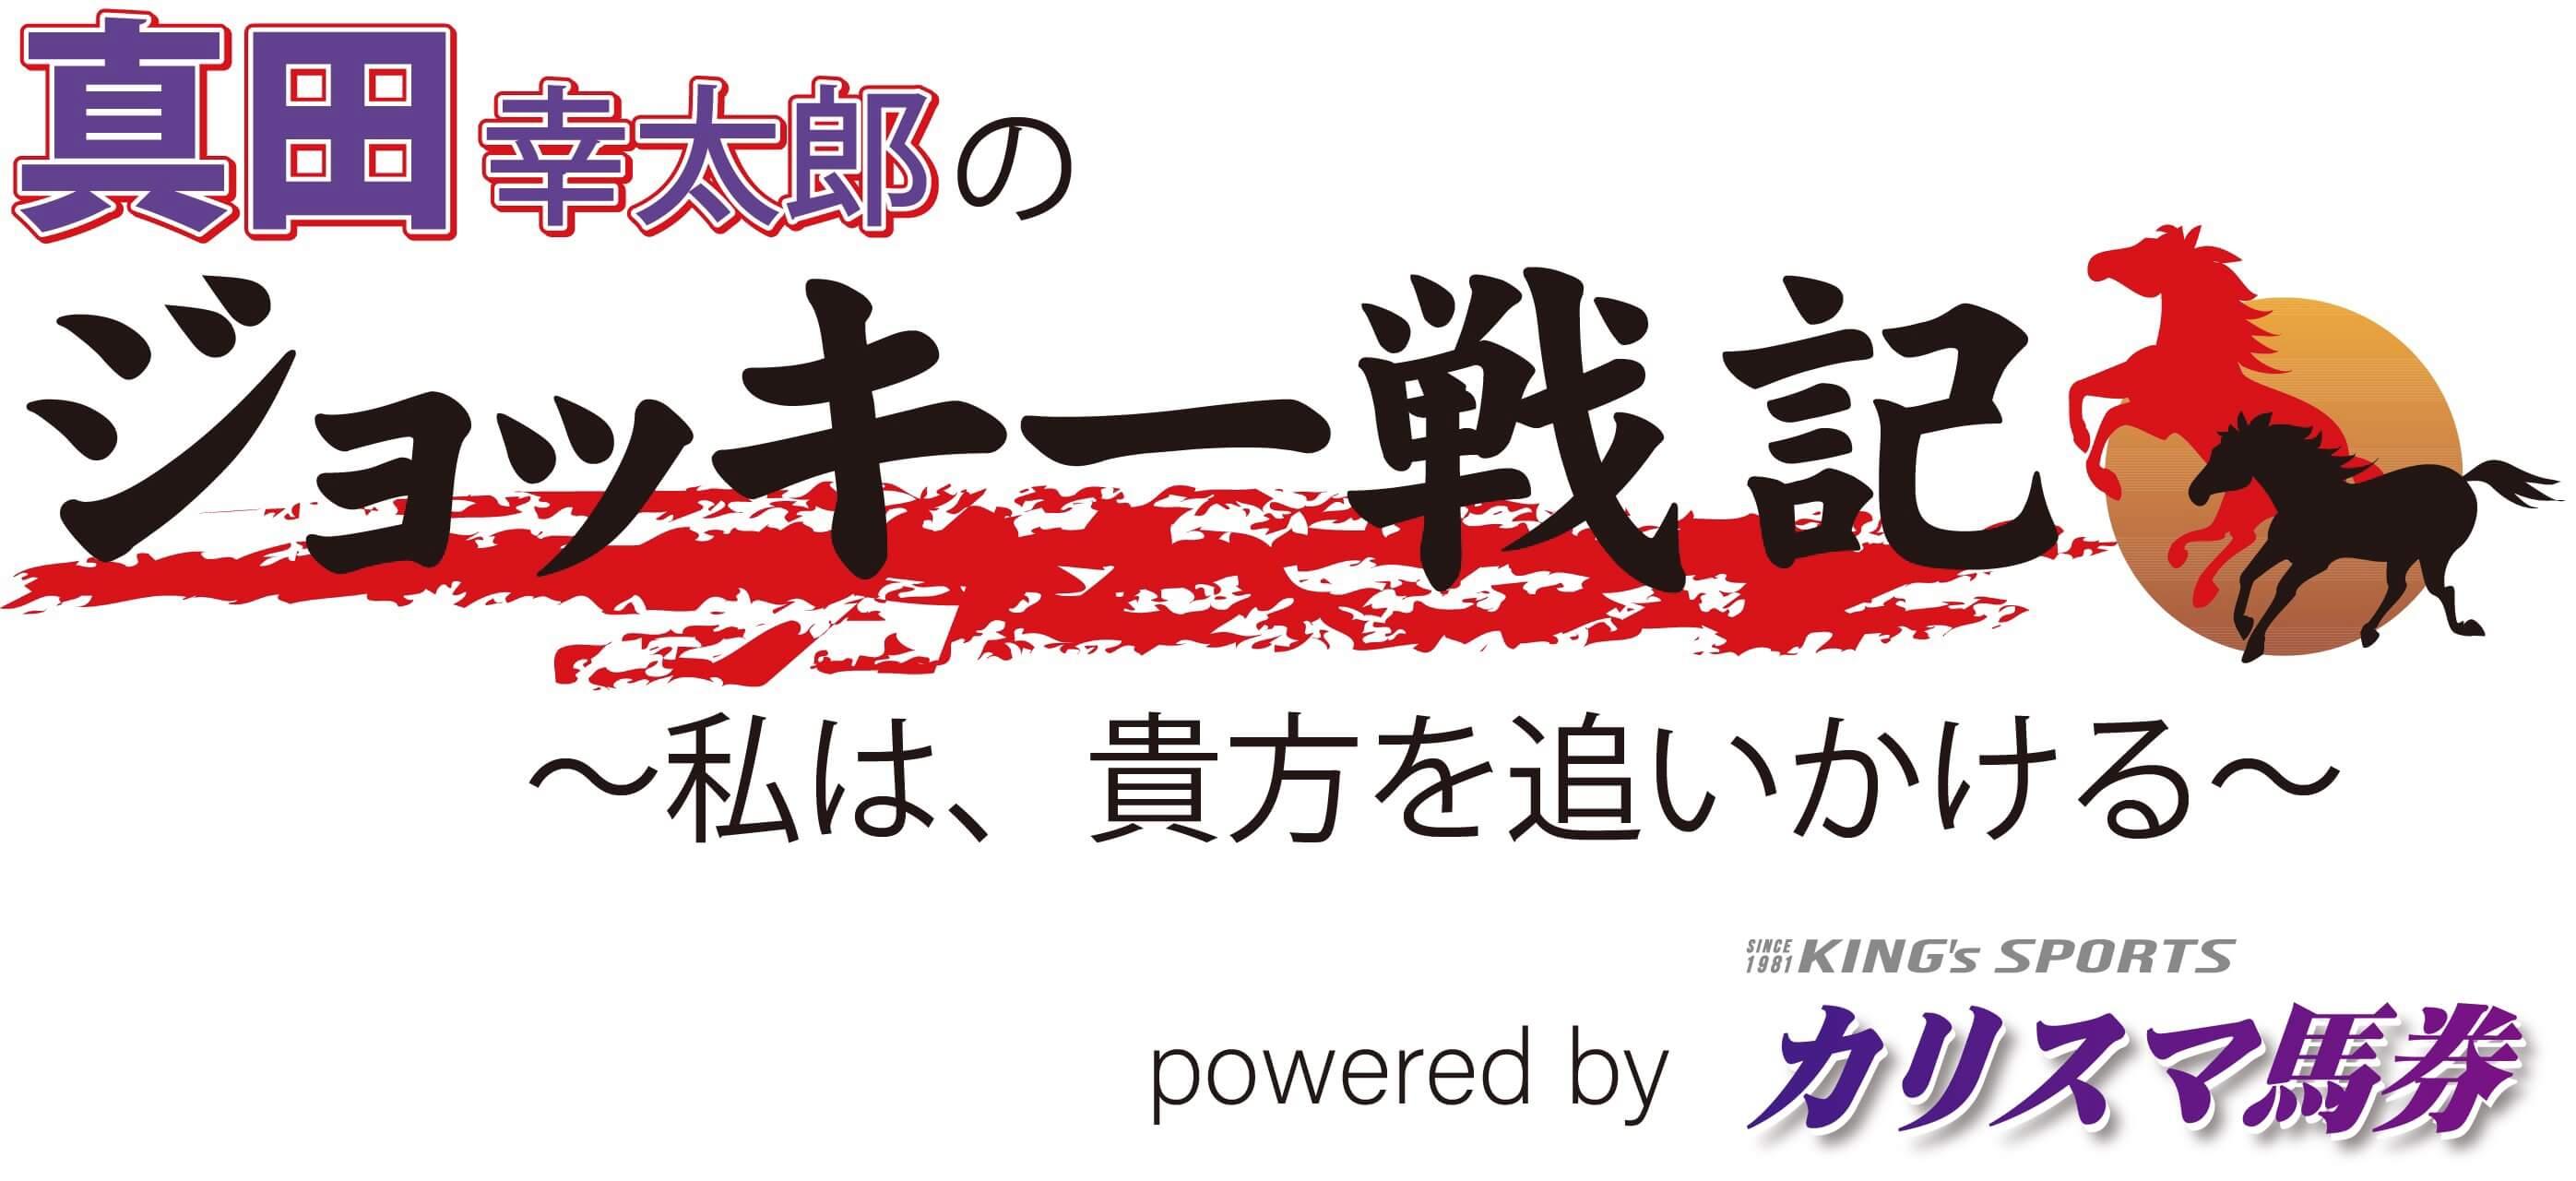 中山 記念 2021 中山記念2021|芸能人・有名人・プロ予想まとめ、林修・細江純子・井...